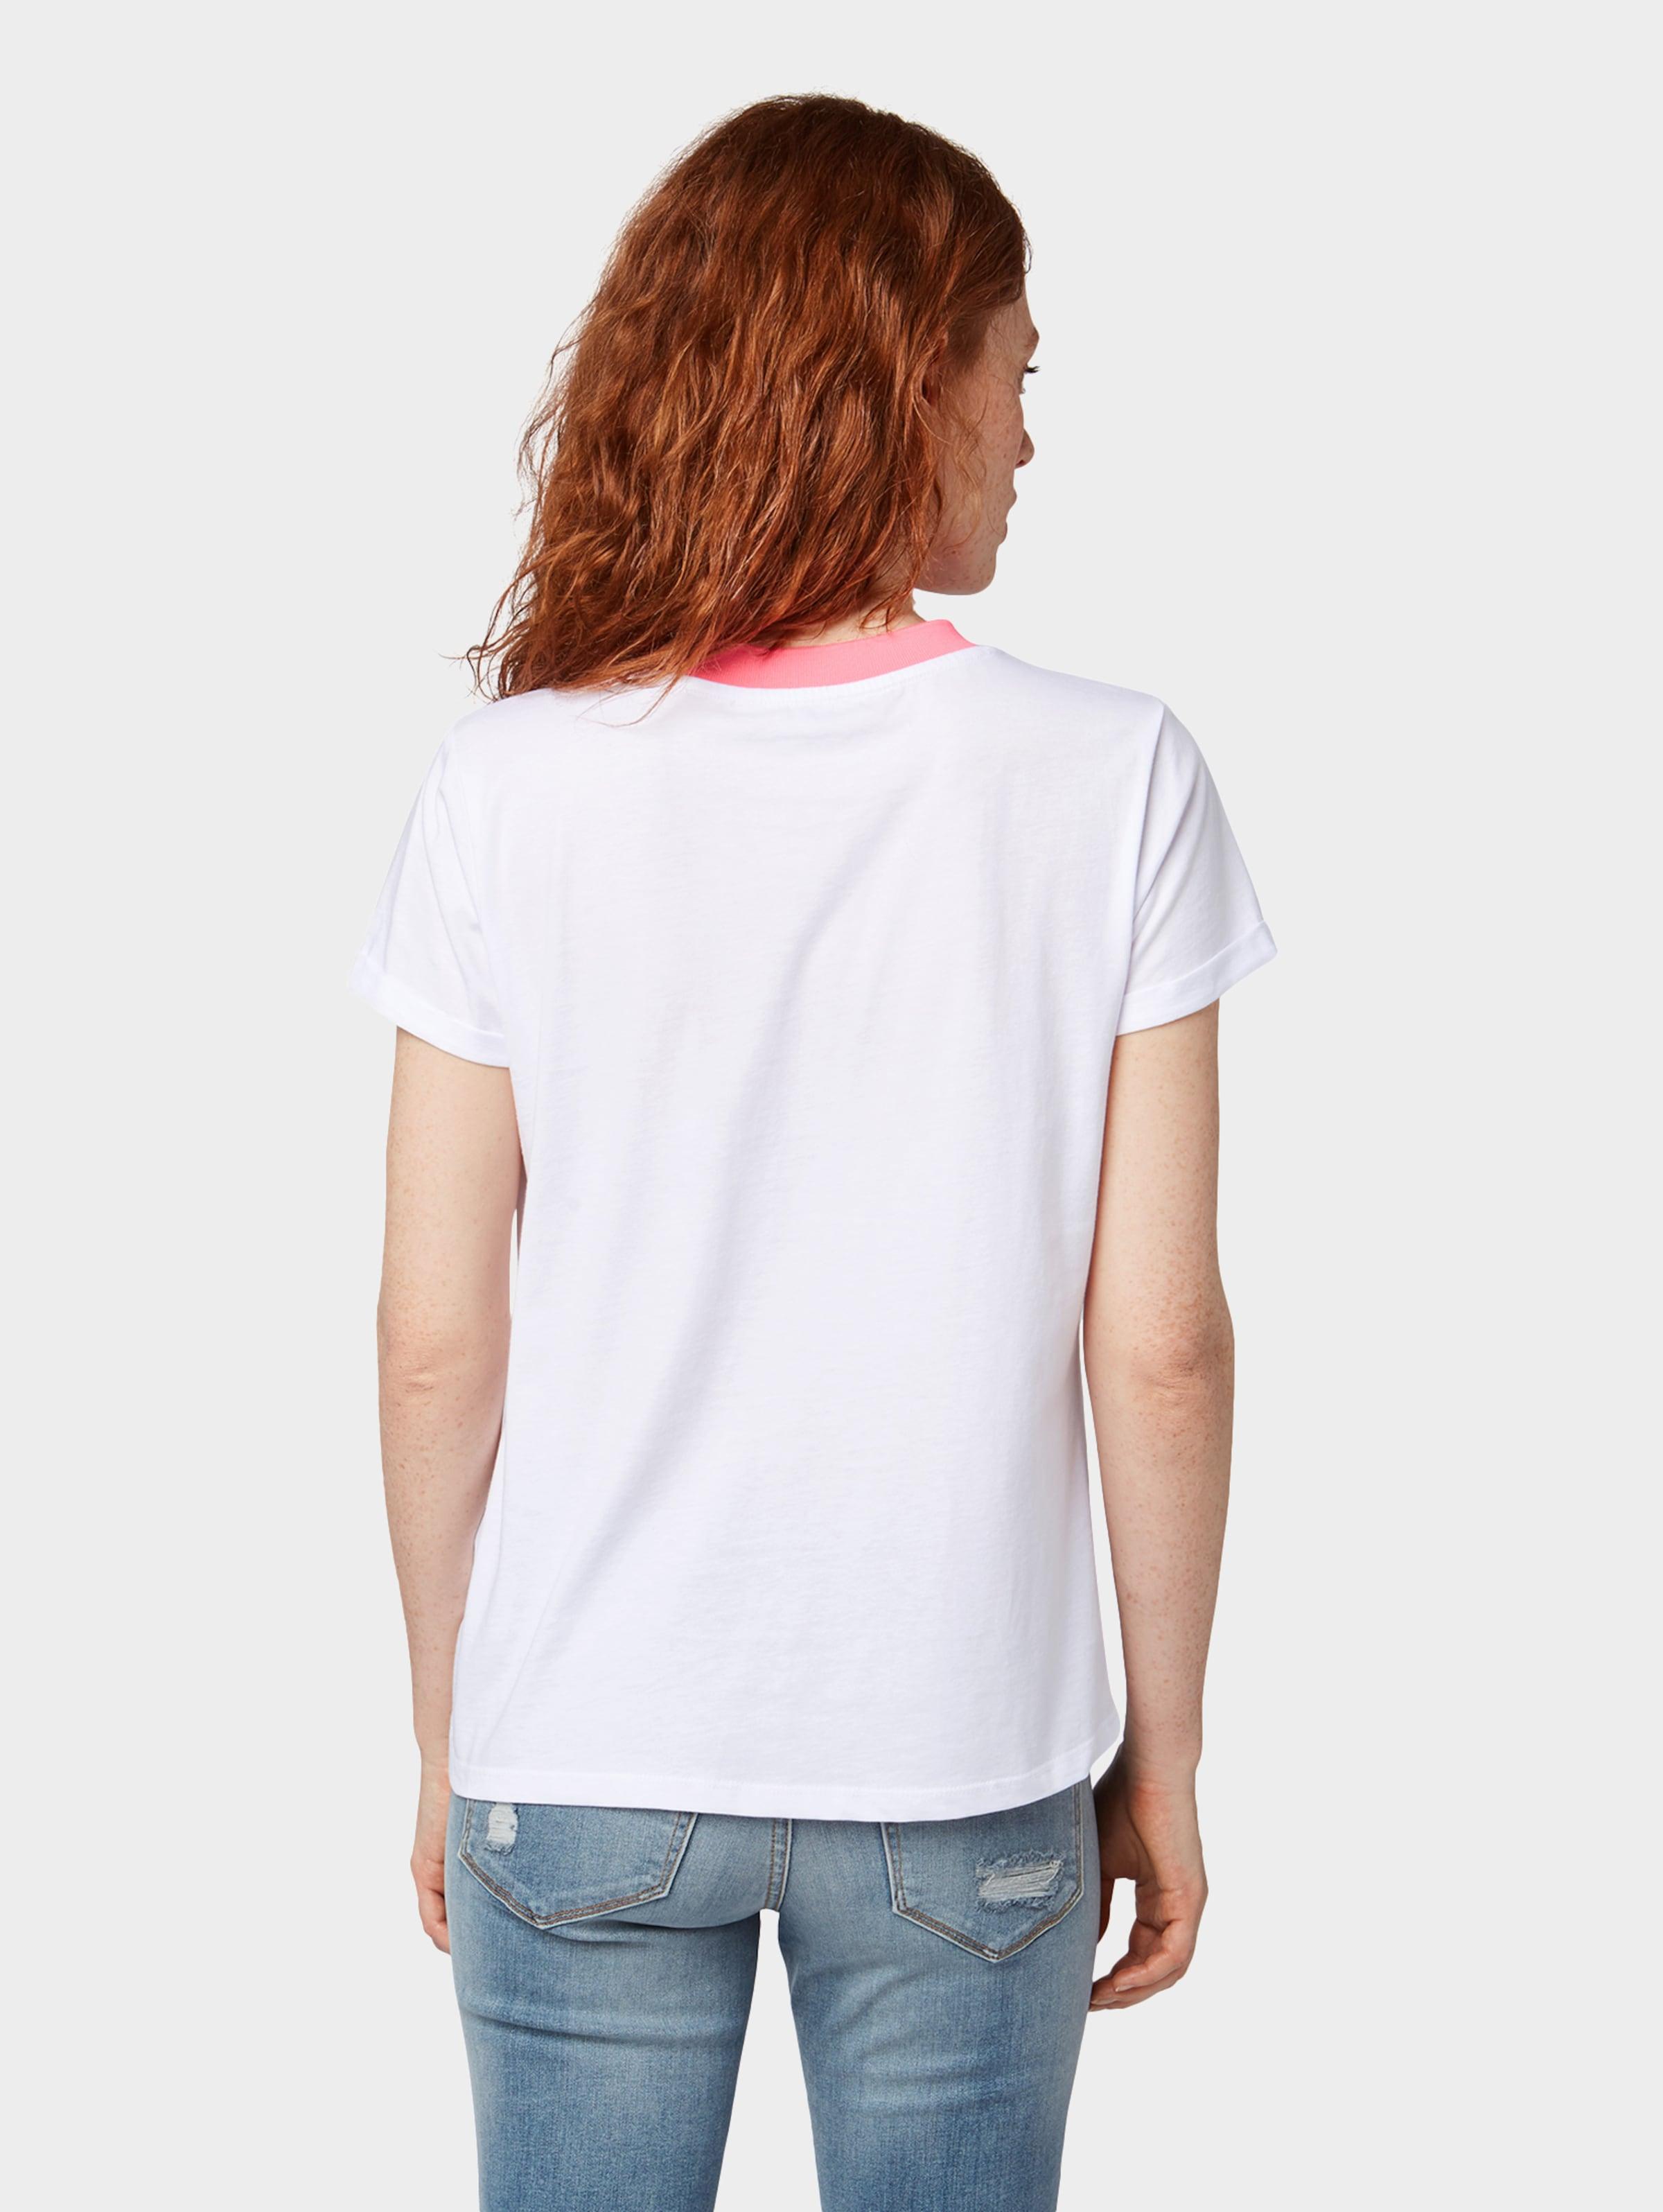 Tom In T RoséWeiß shirt Tailor Denim Lj34AR5